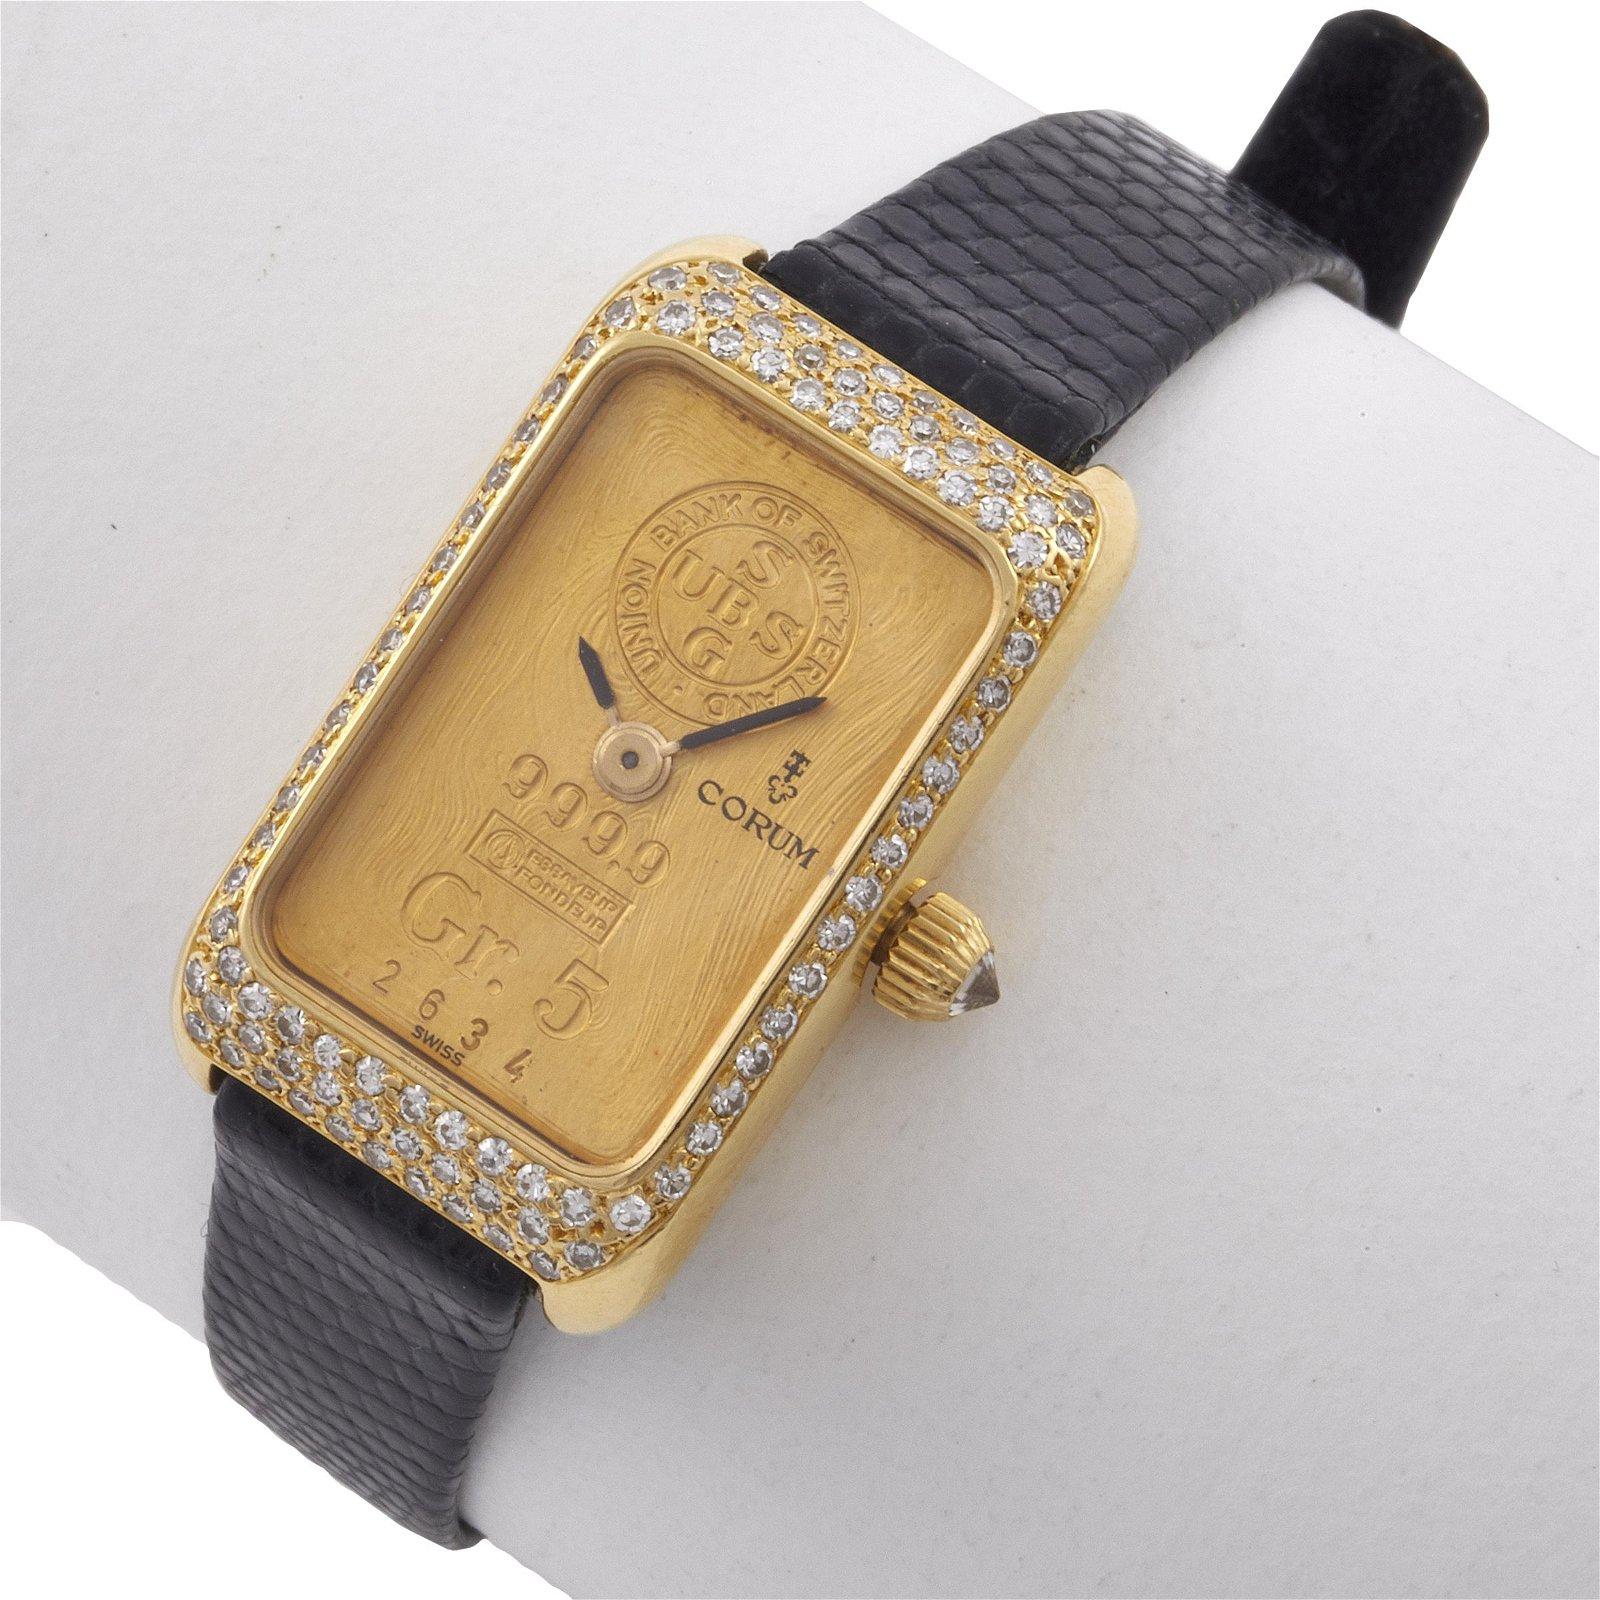 Corum Diamond, Gr. 5 Ingot, 18k Yellow Gold Wristwatch